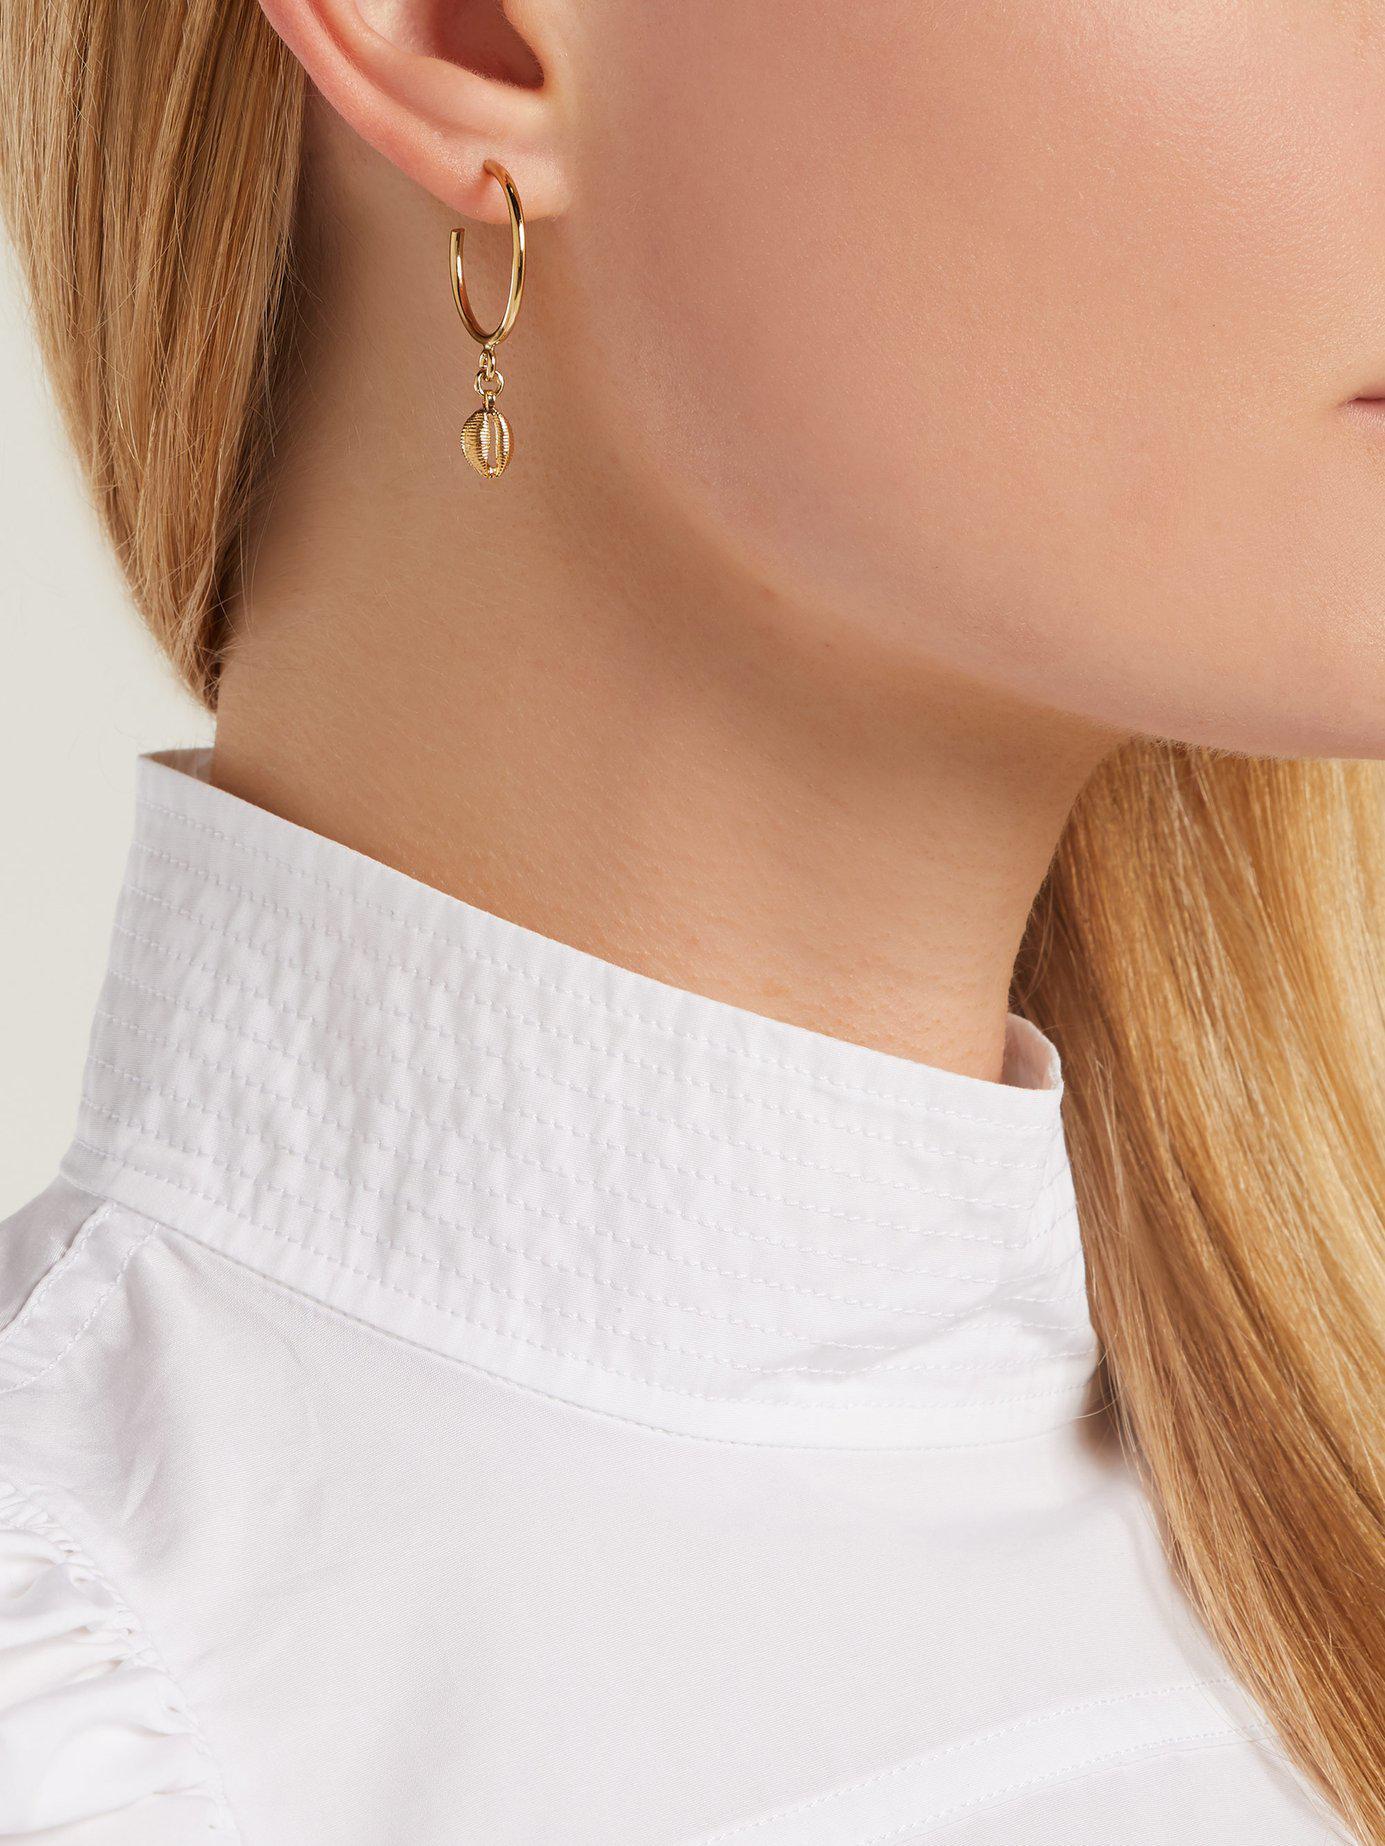 c20eacf213 Isabel Marant Shell Drop Hoop Earrings in Metallic - Lyst